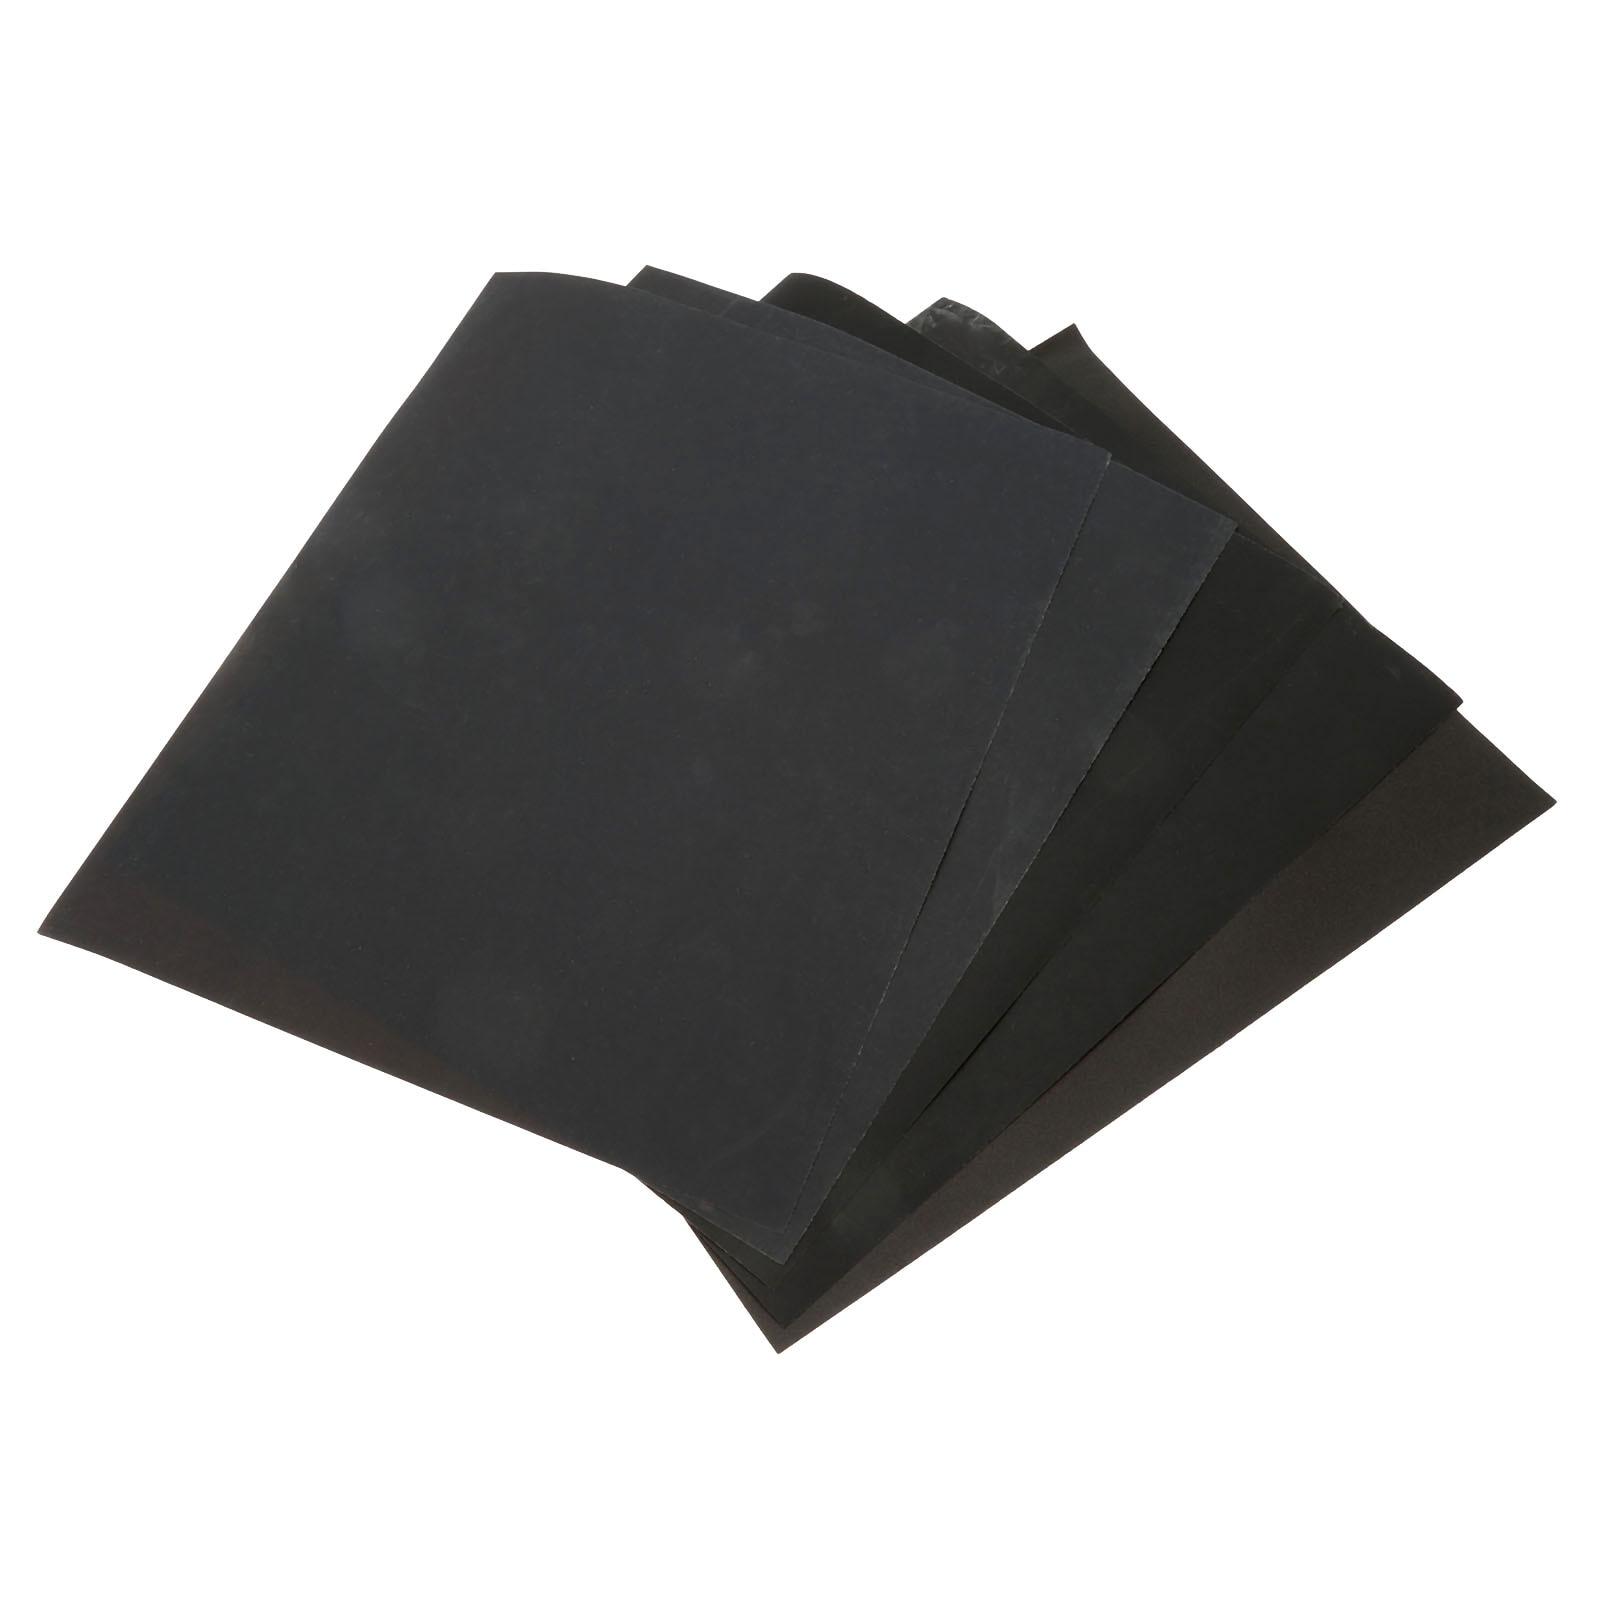 DRELD 5 fogli carta abrasiva impermeabile carta abrasiva carta - Utensili abrasivi - Fotografia 6